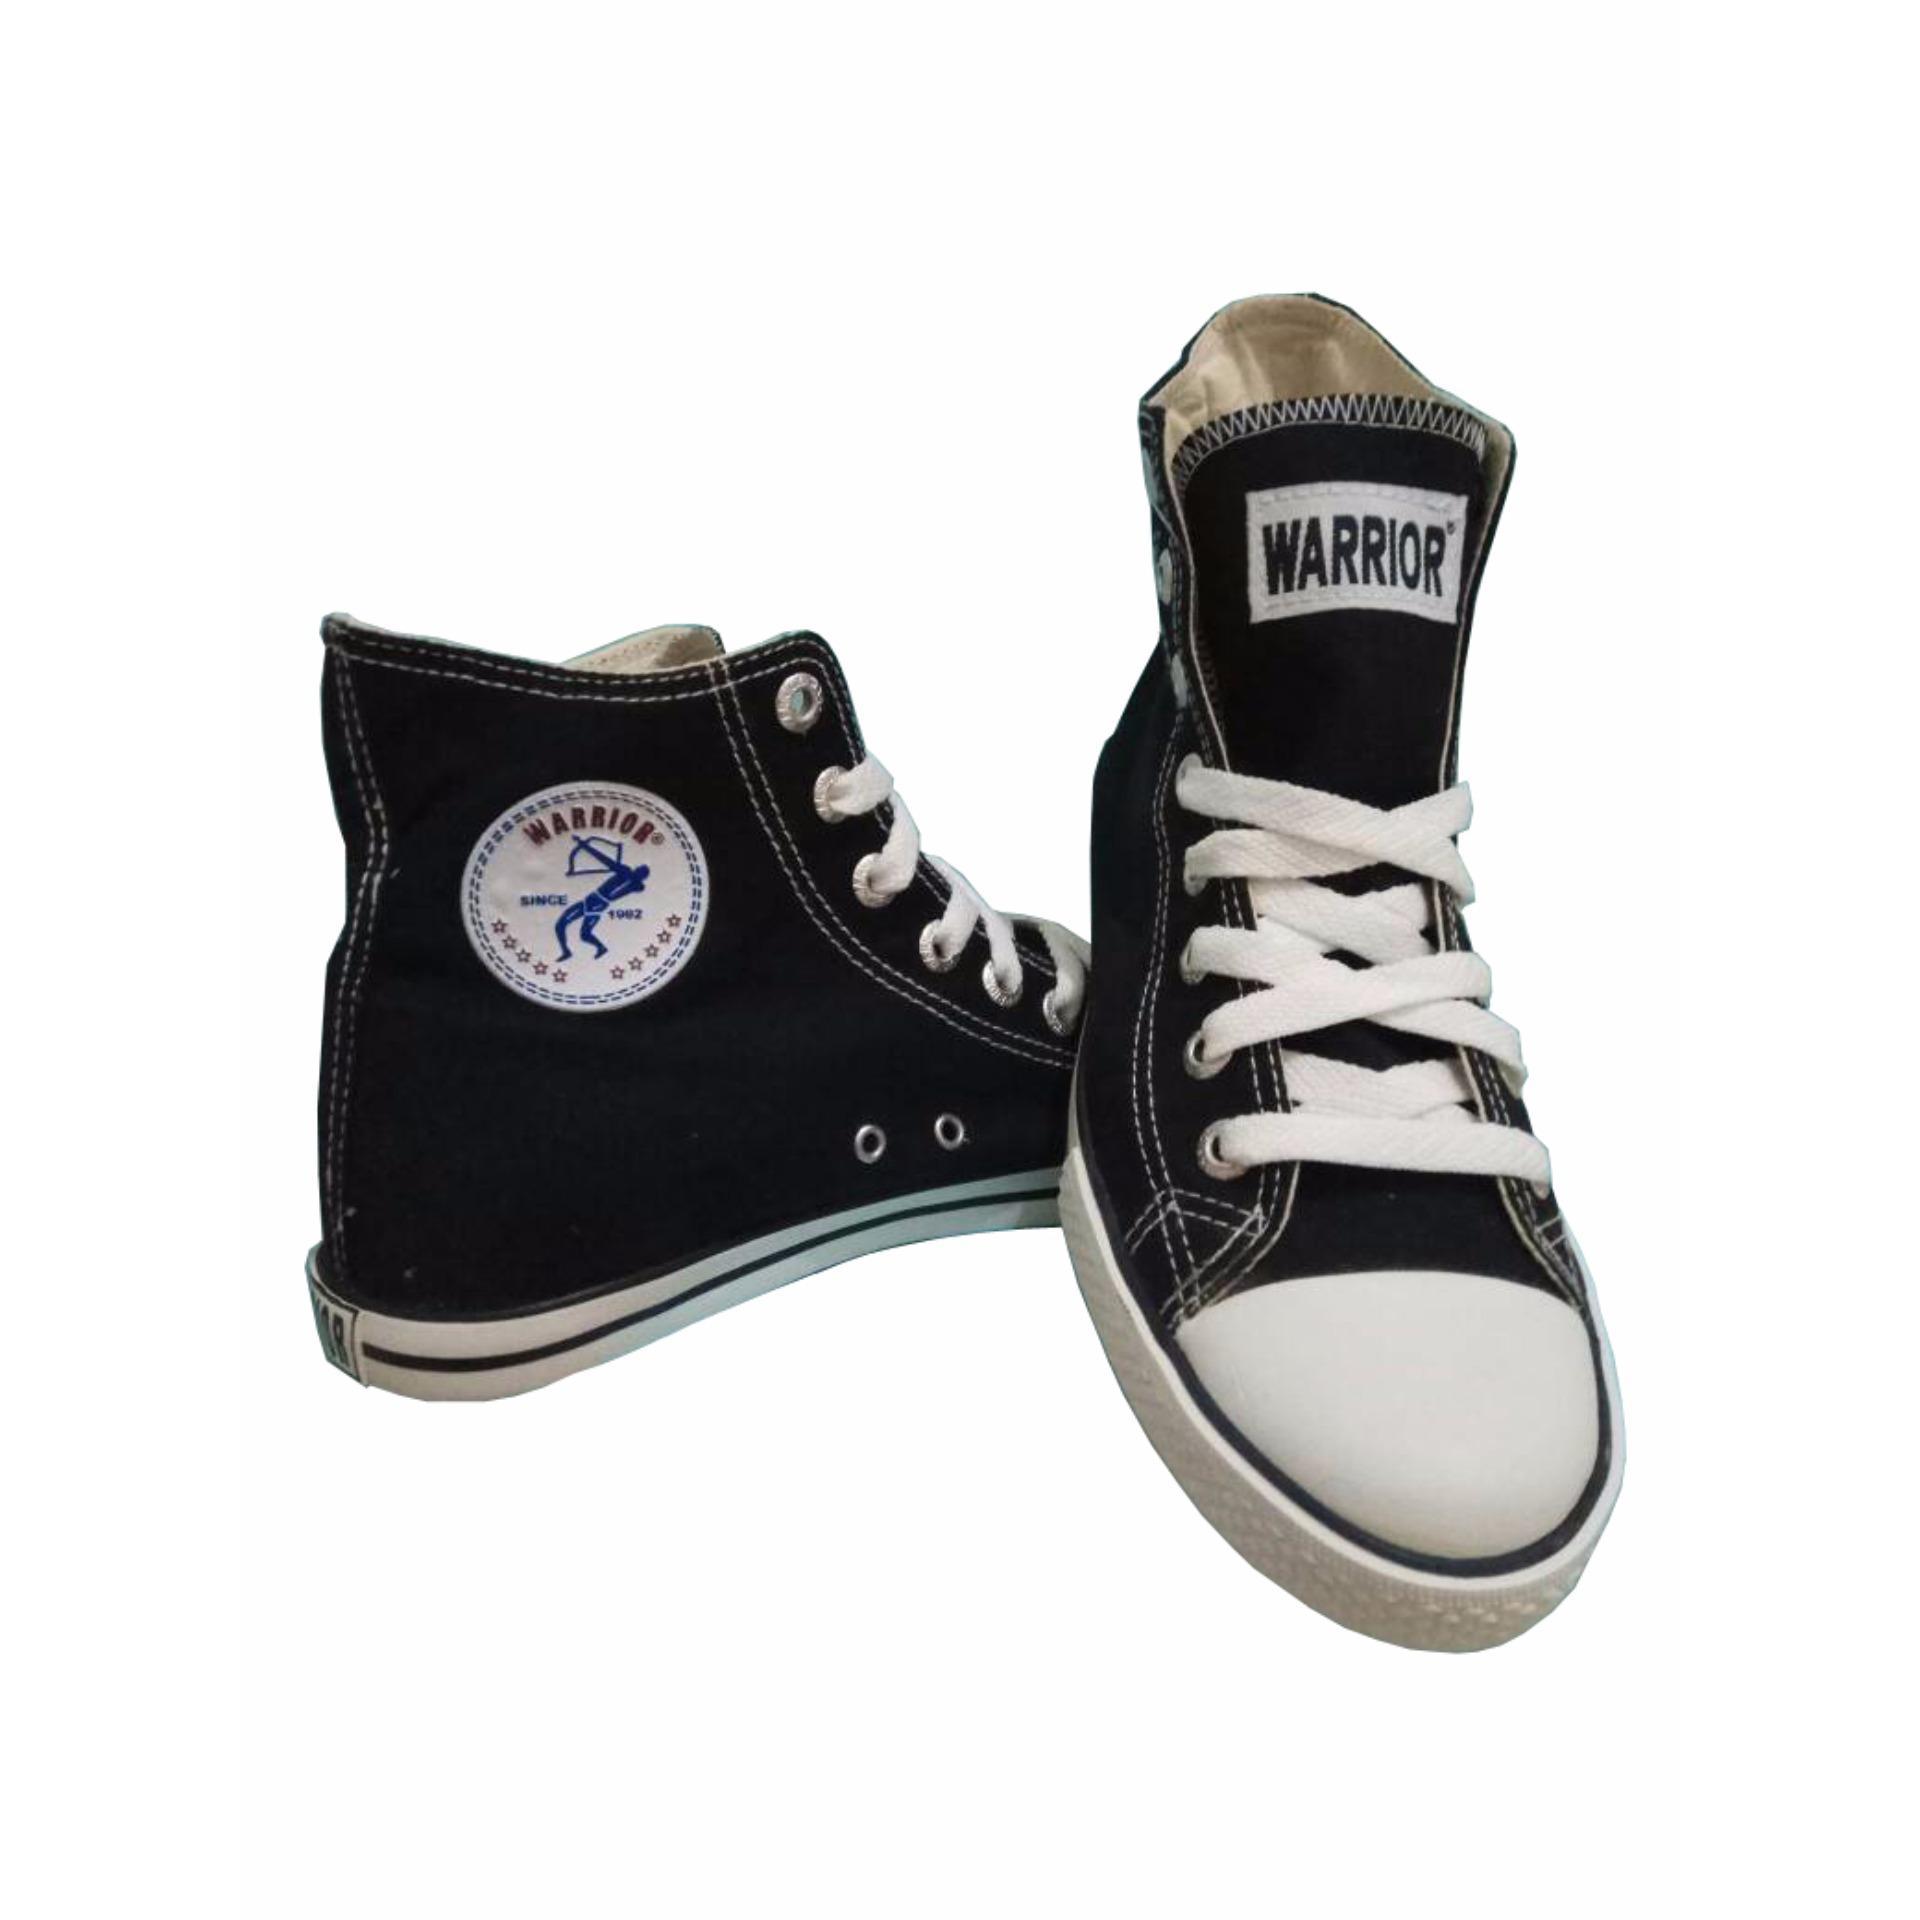 Harga Hemat Sepatu Sekolah Warrior Athena High Cut Hitam Putih